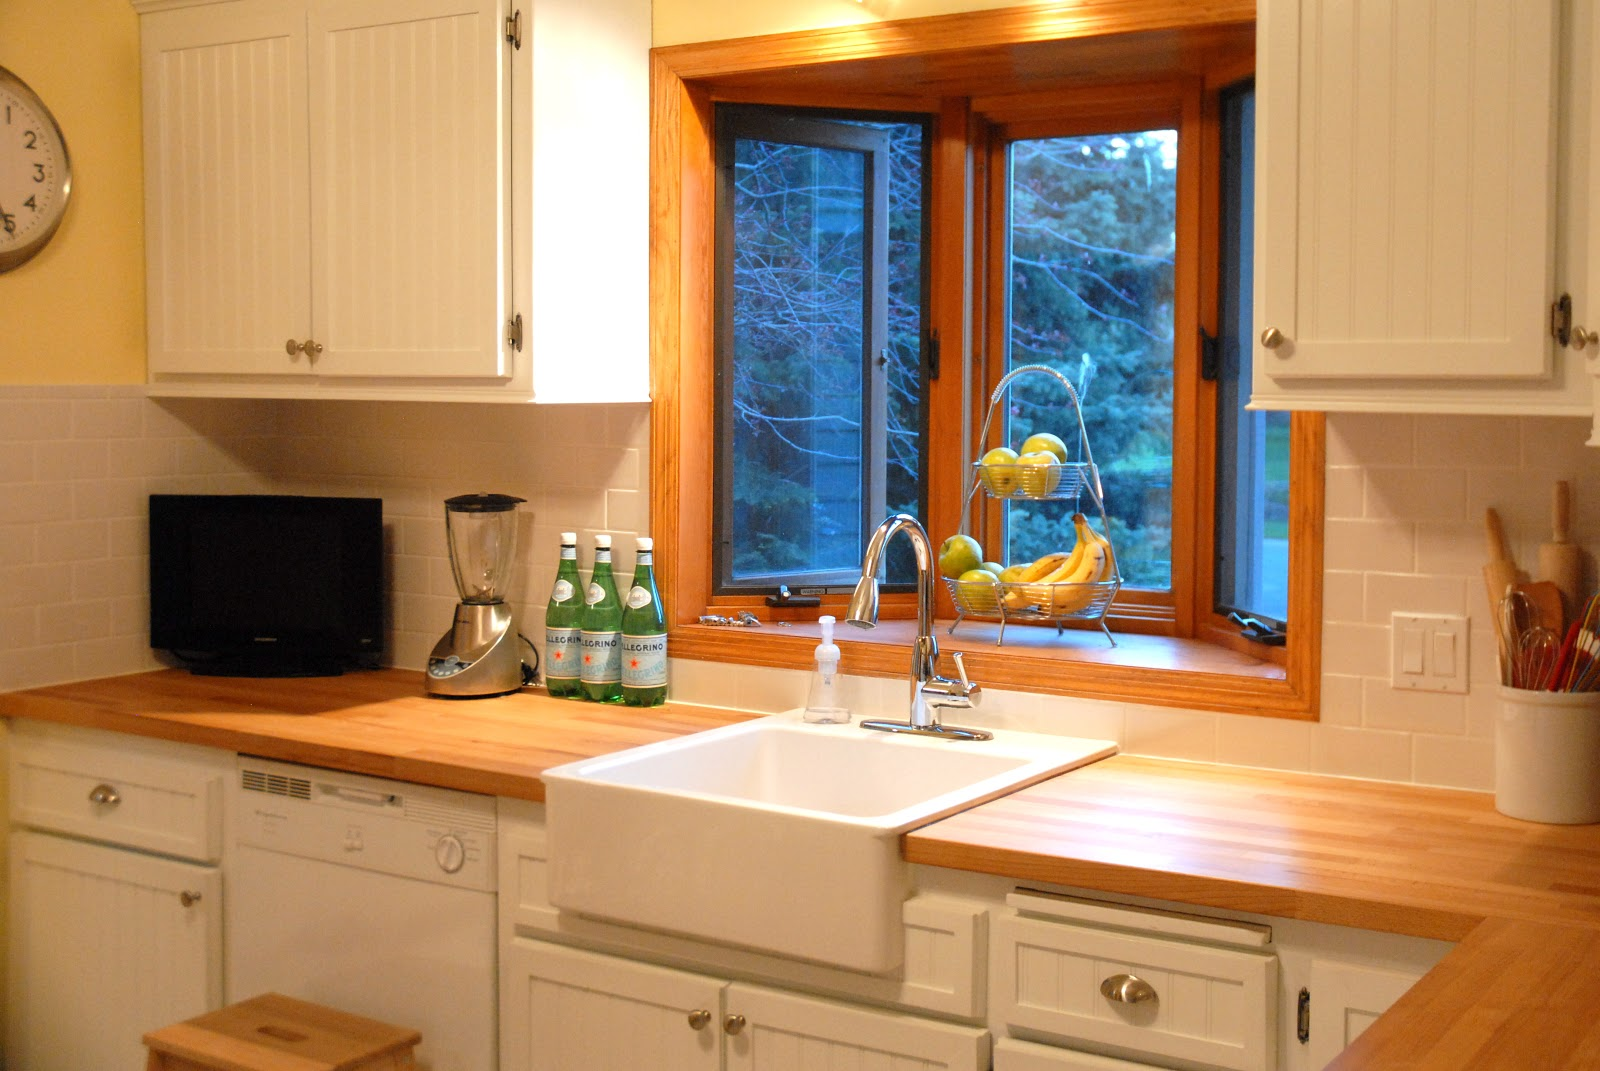 Remodelaholic | House Envy Kitchen Remodel Reveal!